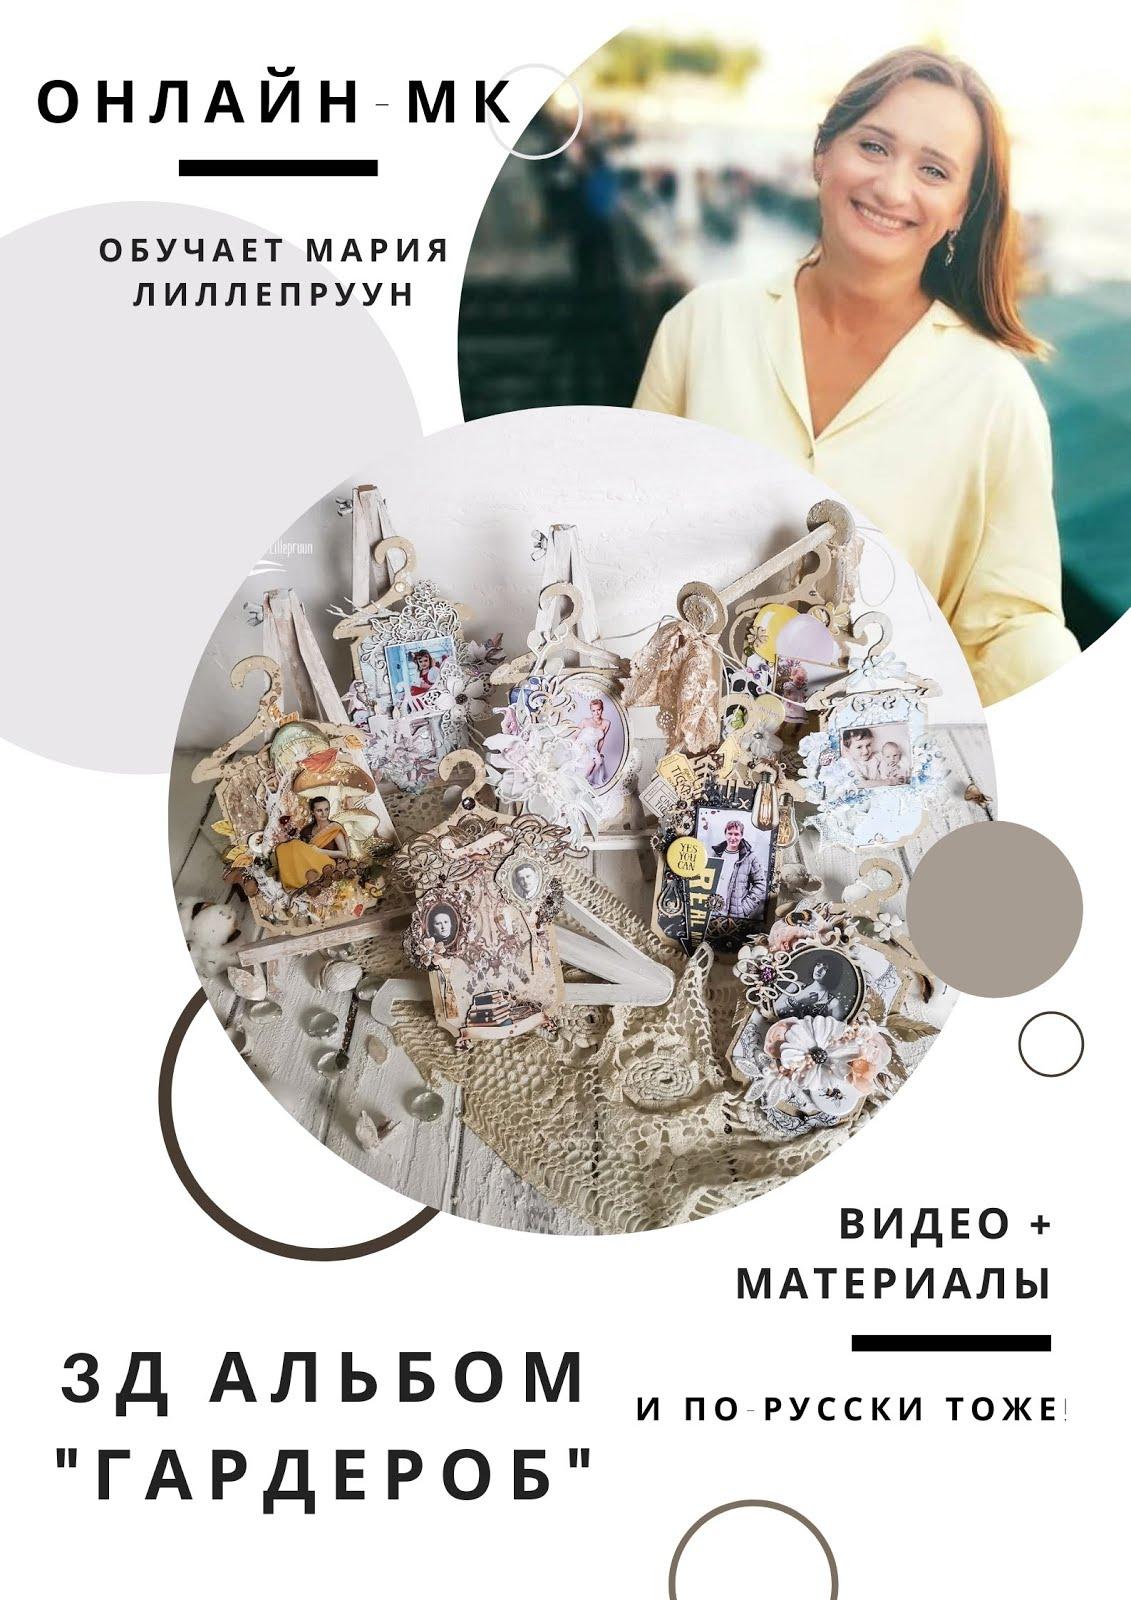 "Онлайн-МК 3Д альбом ""Гардероб"" (на русском языке)"